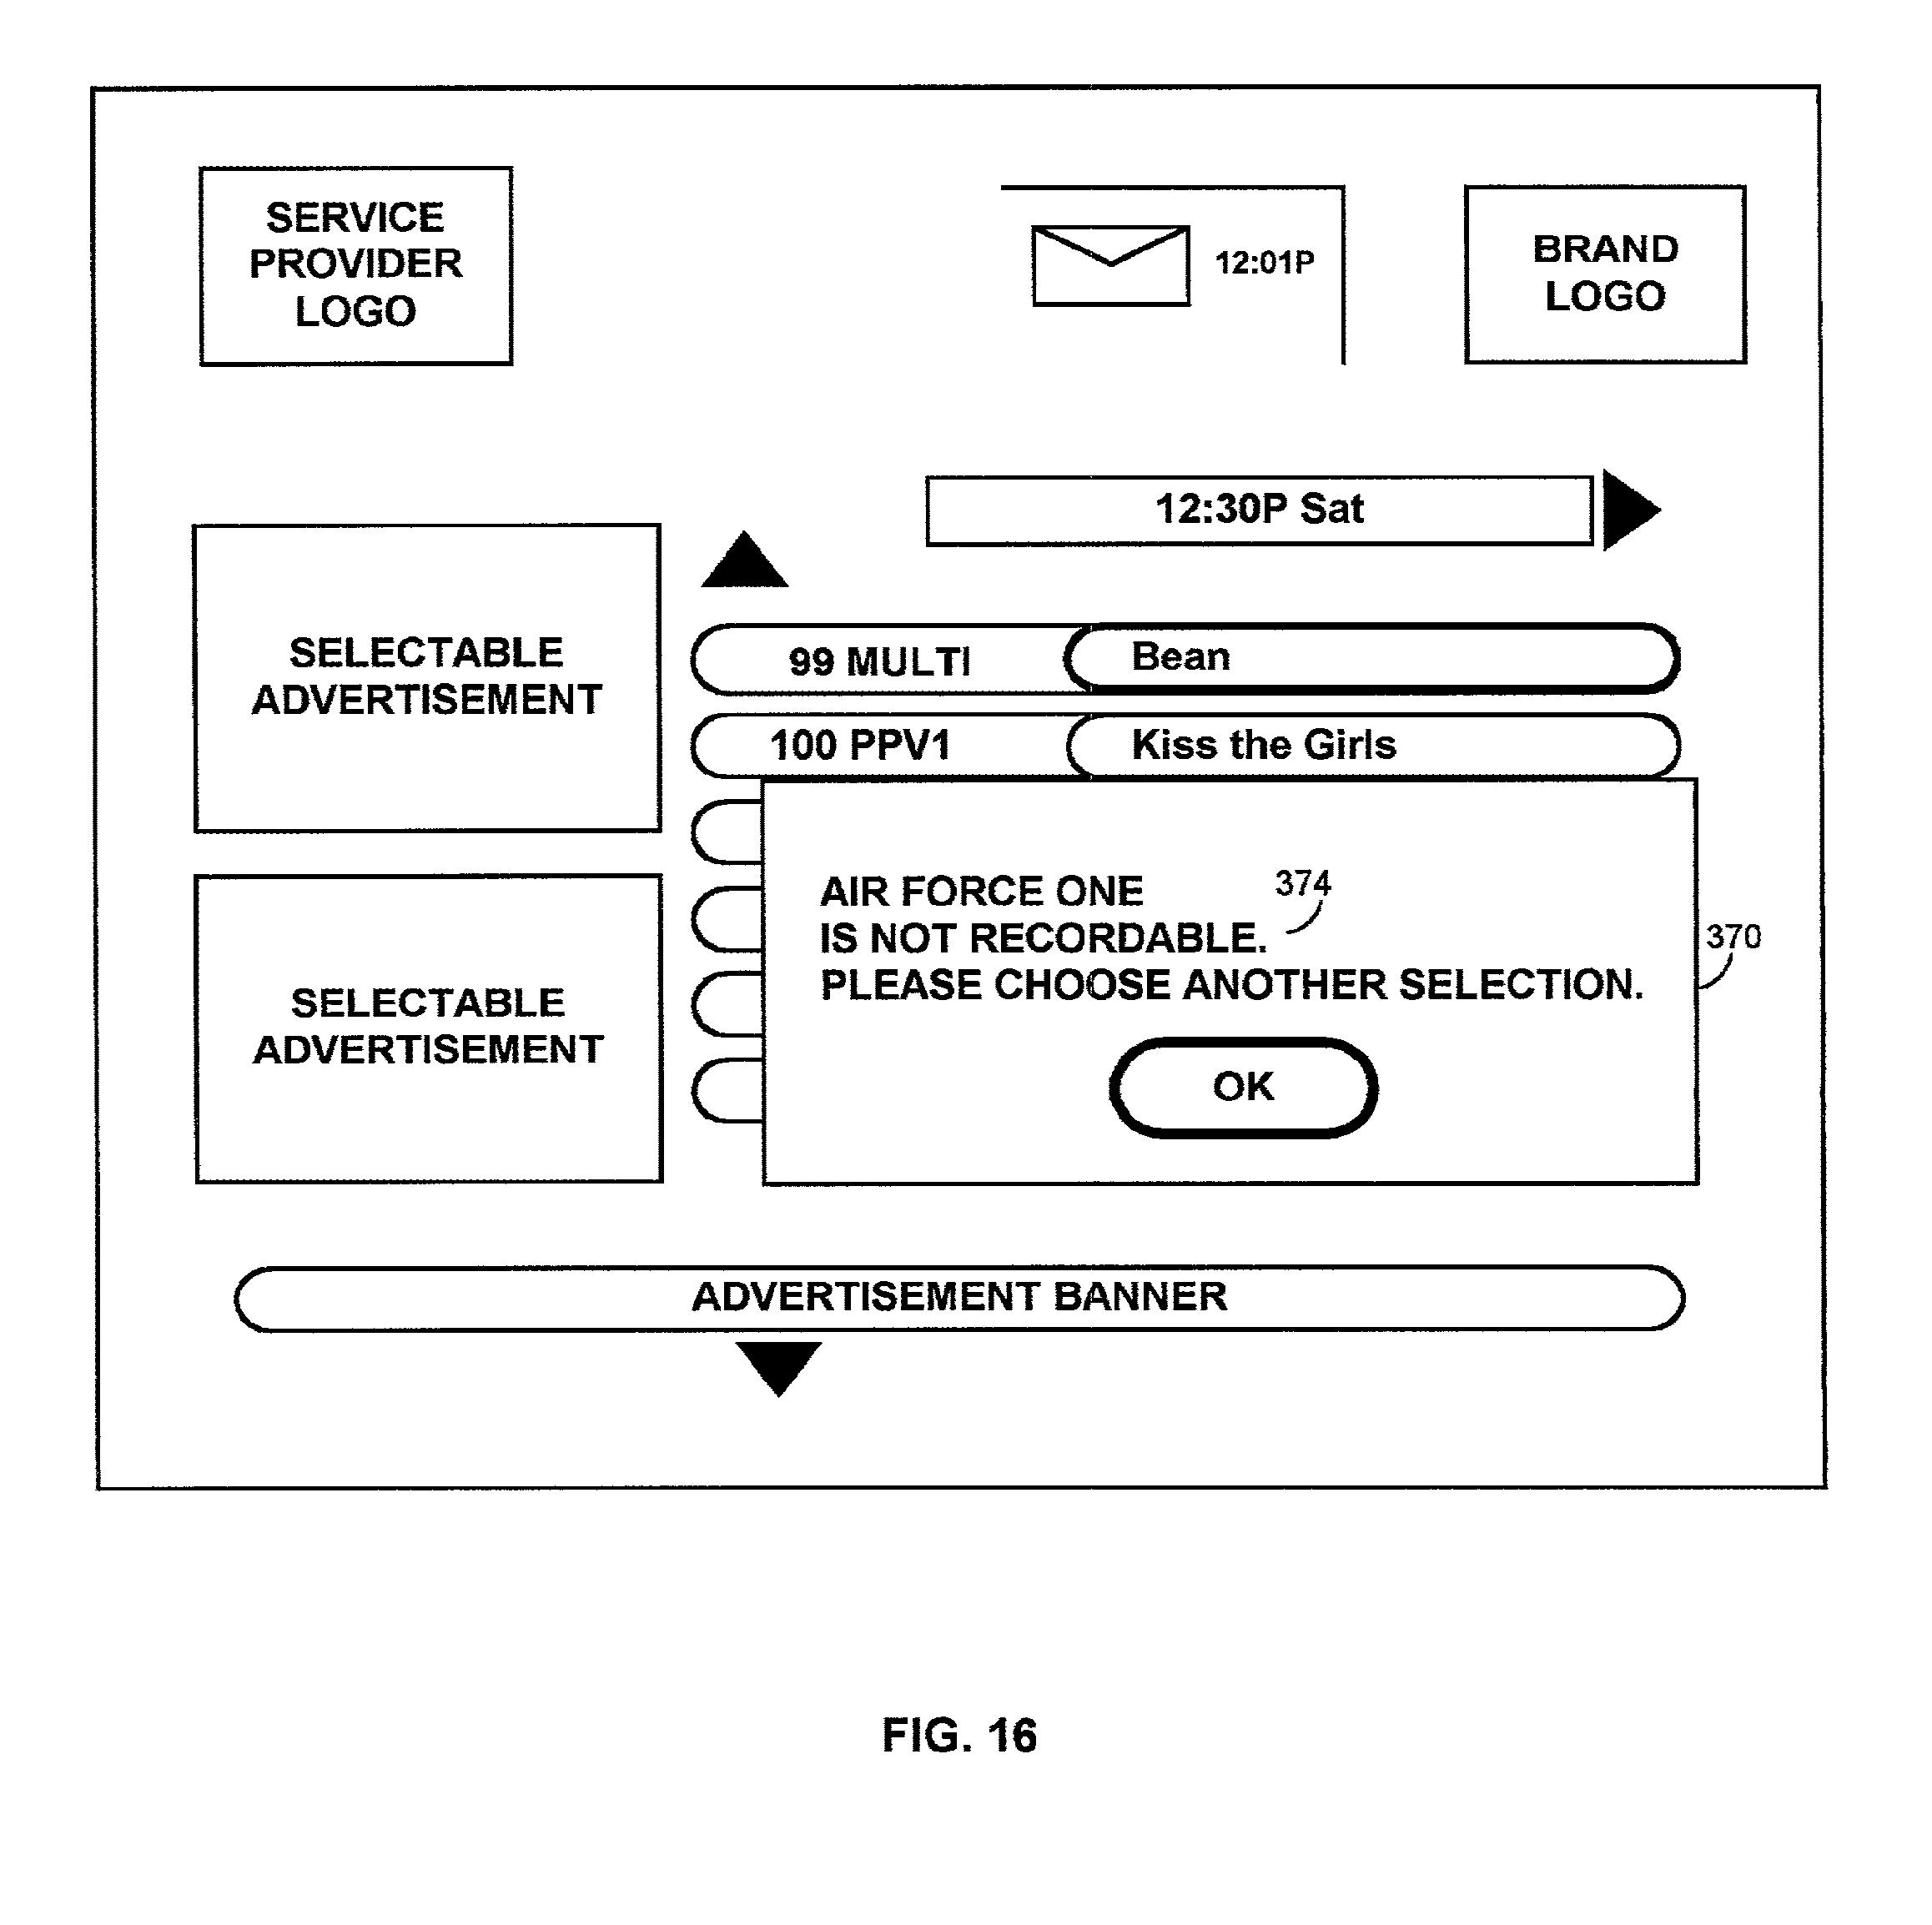 Patent US 9,021,538 B2